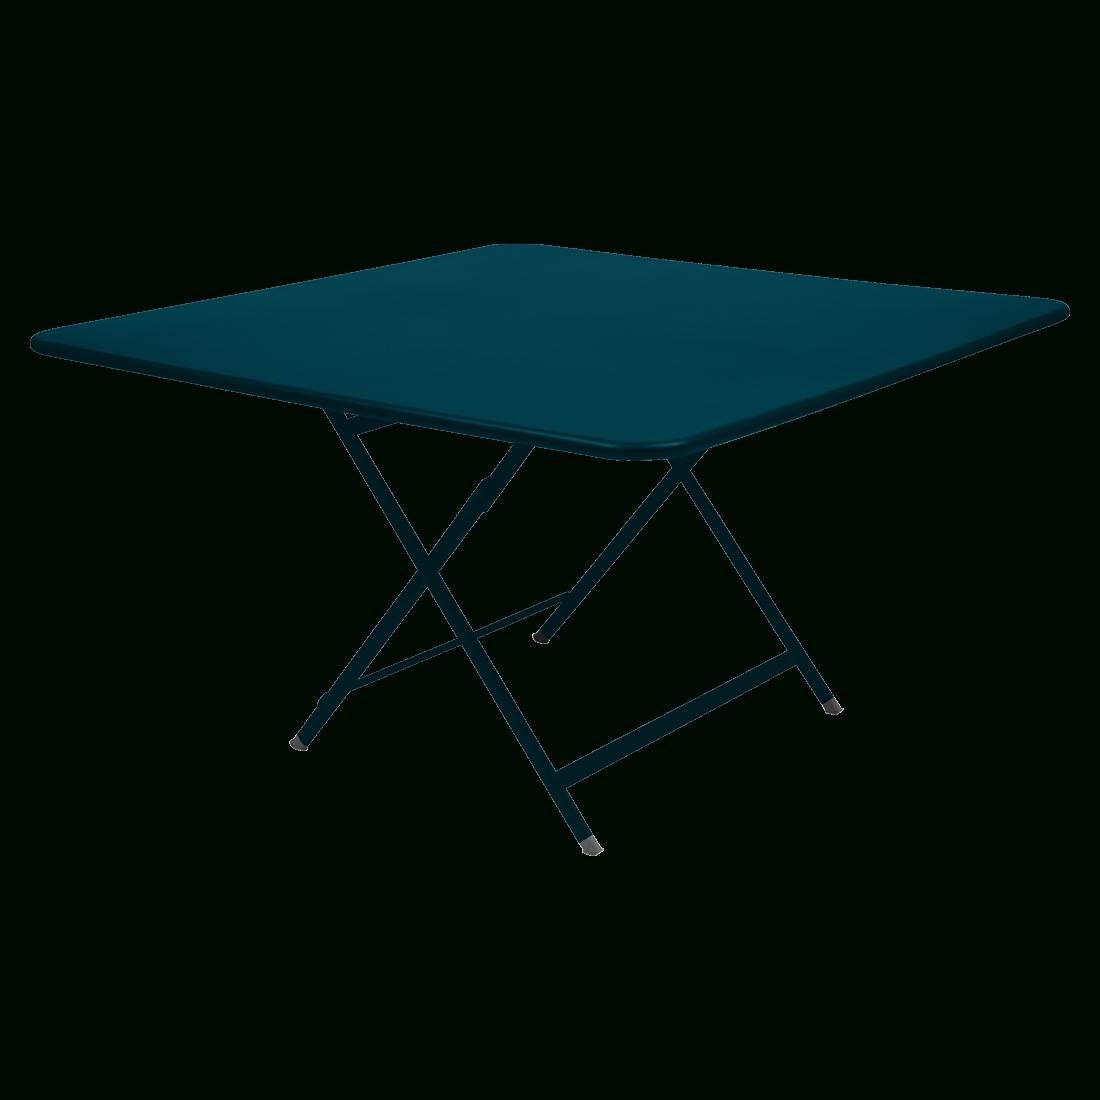 Caractère Square Table, Garden Table For 8, Outdoor Furniture avec Table De Jardin Metal Pliante